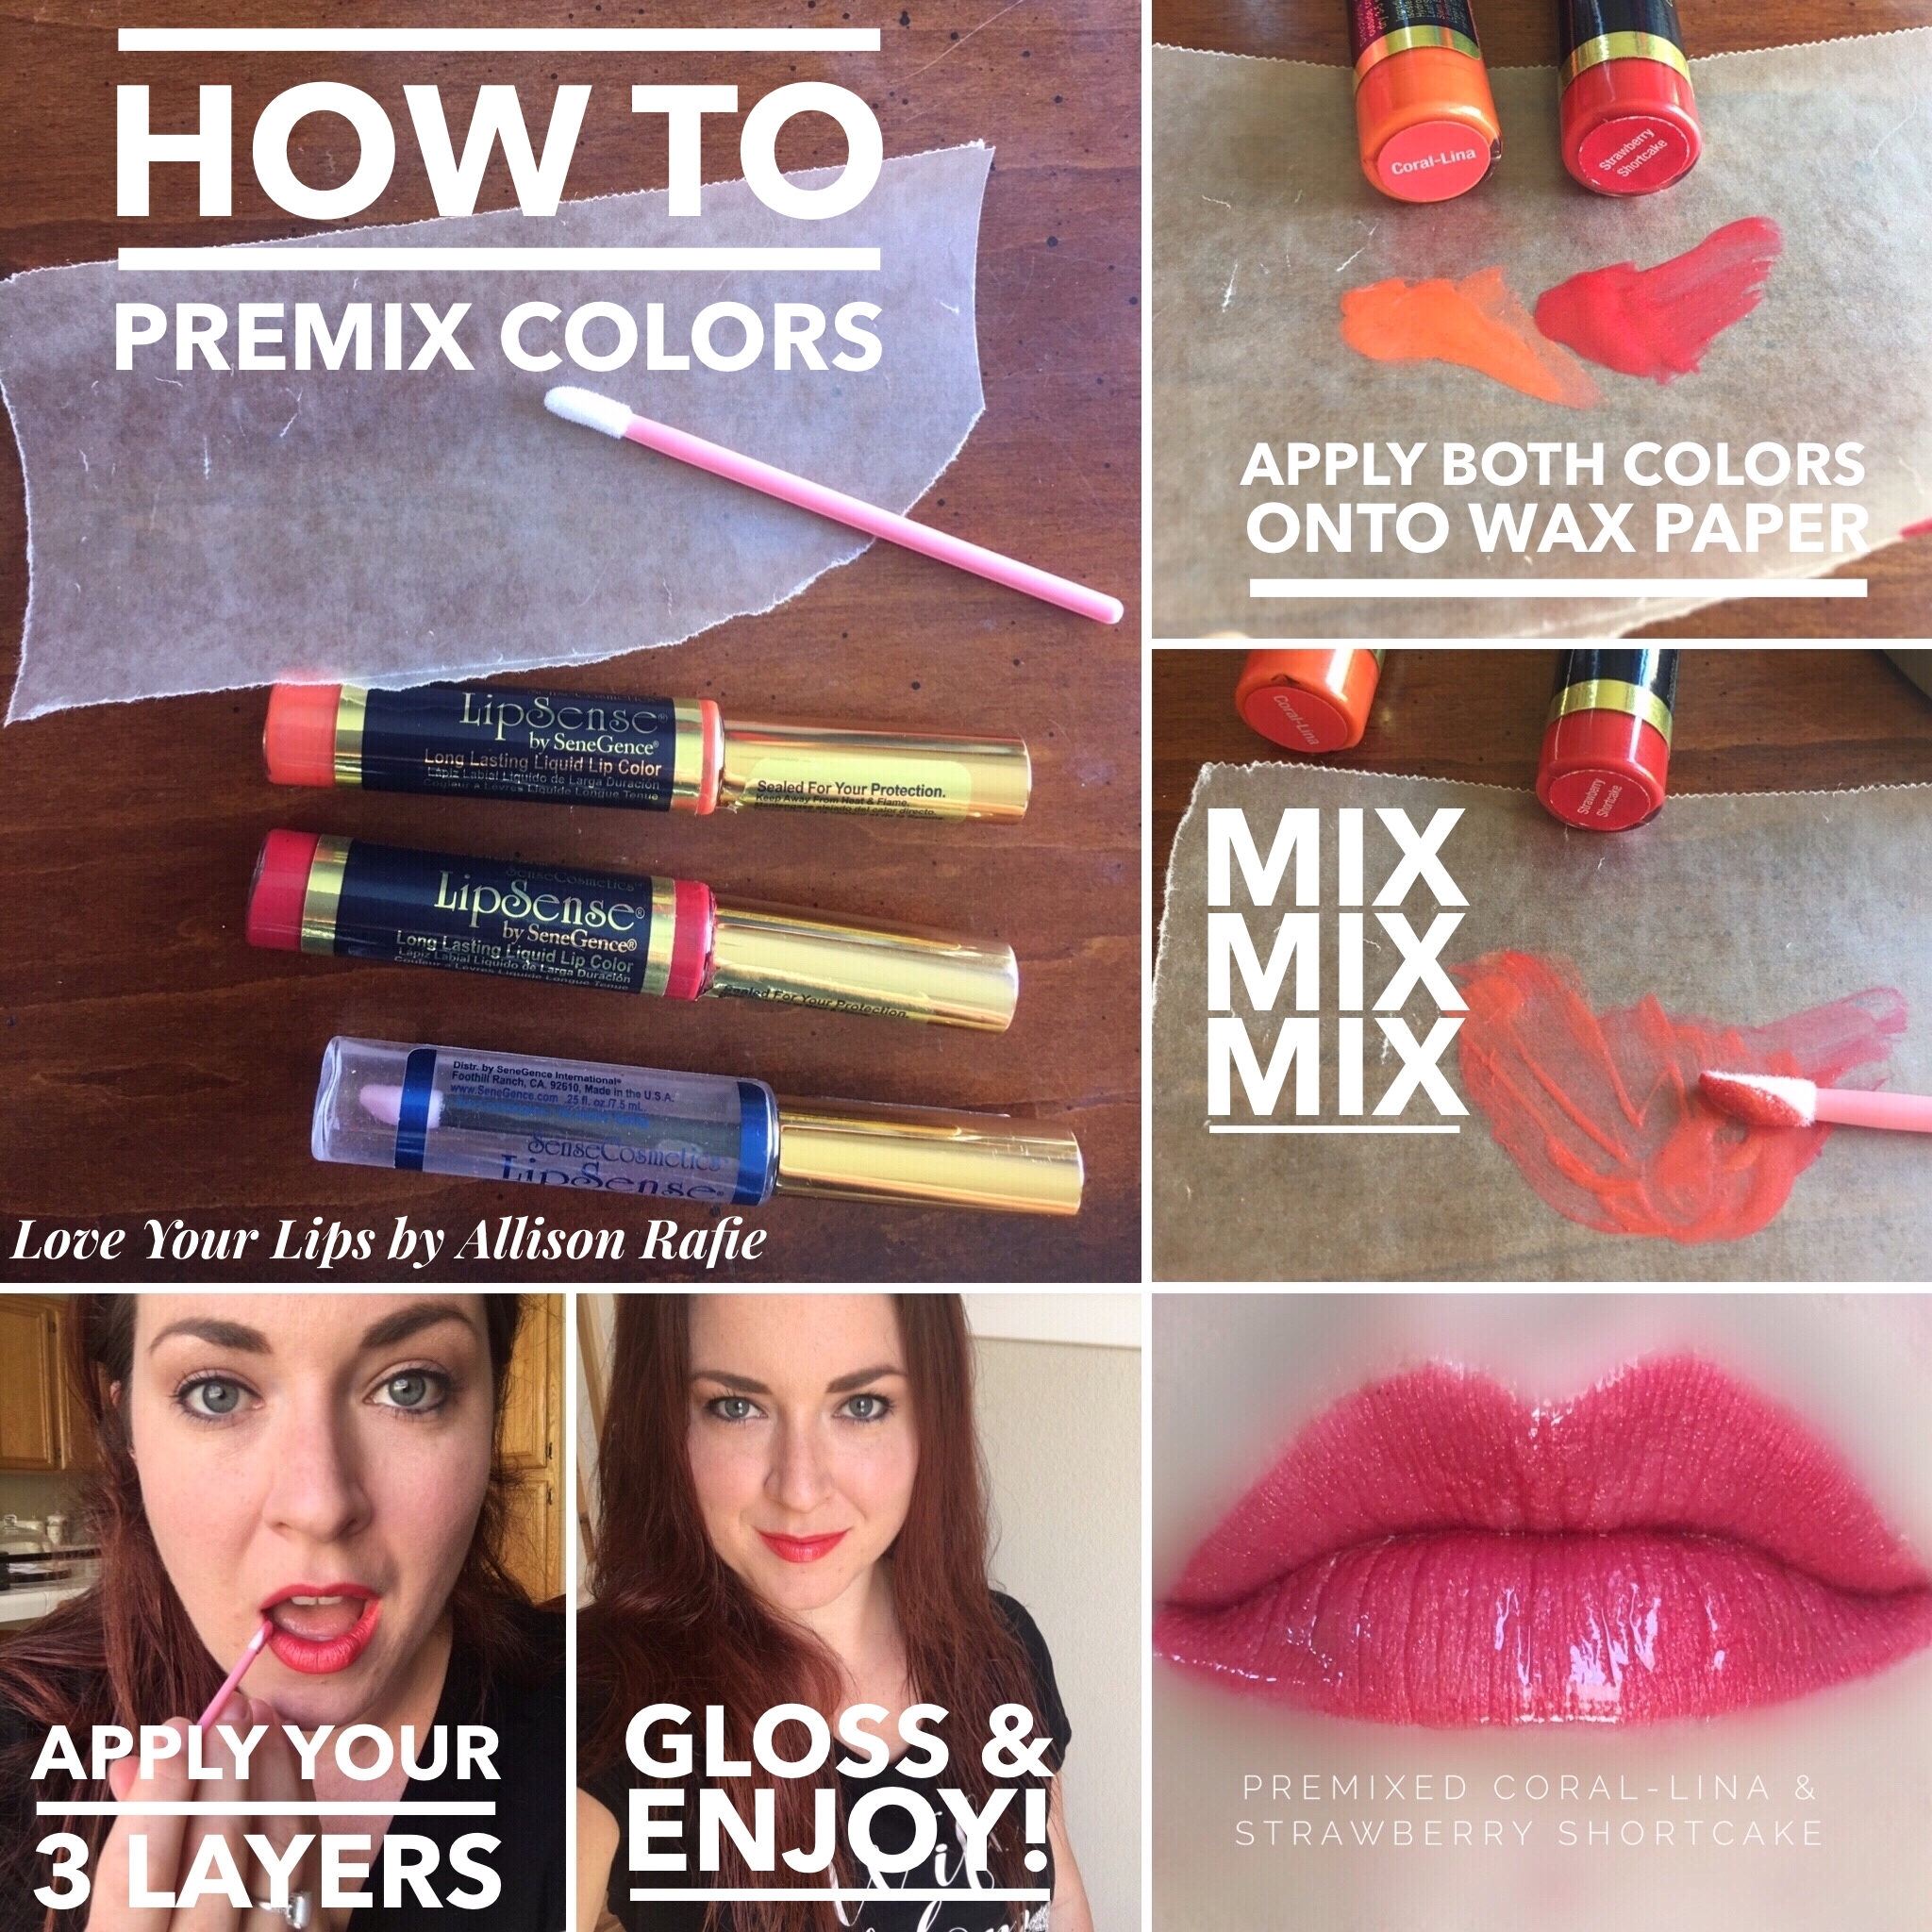 How to premix LipSense Colors #corallina #strawberryshortcake Distributer #328364 Love Your Lips by Allison Rafie Follow me on Instagram @luvurlips www.facebook.com/groups/loveyourlipsbyallisonrafie